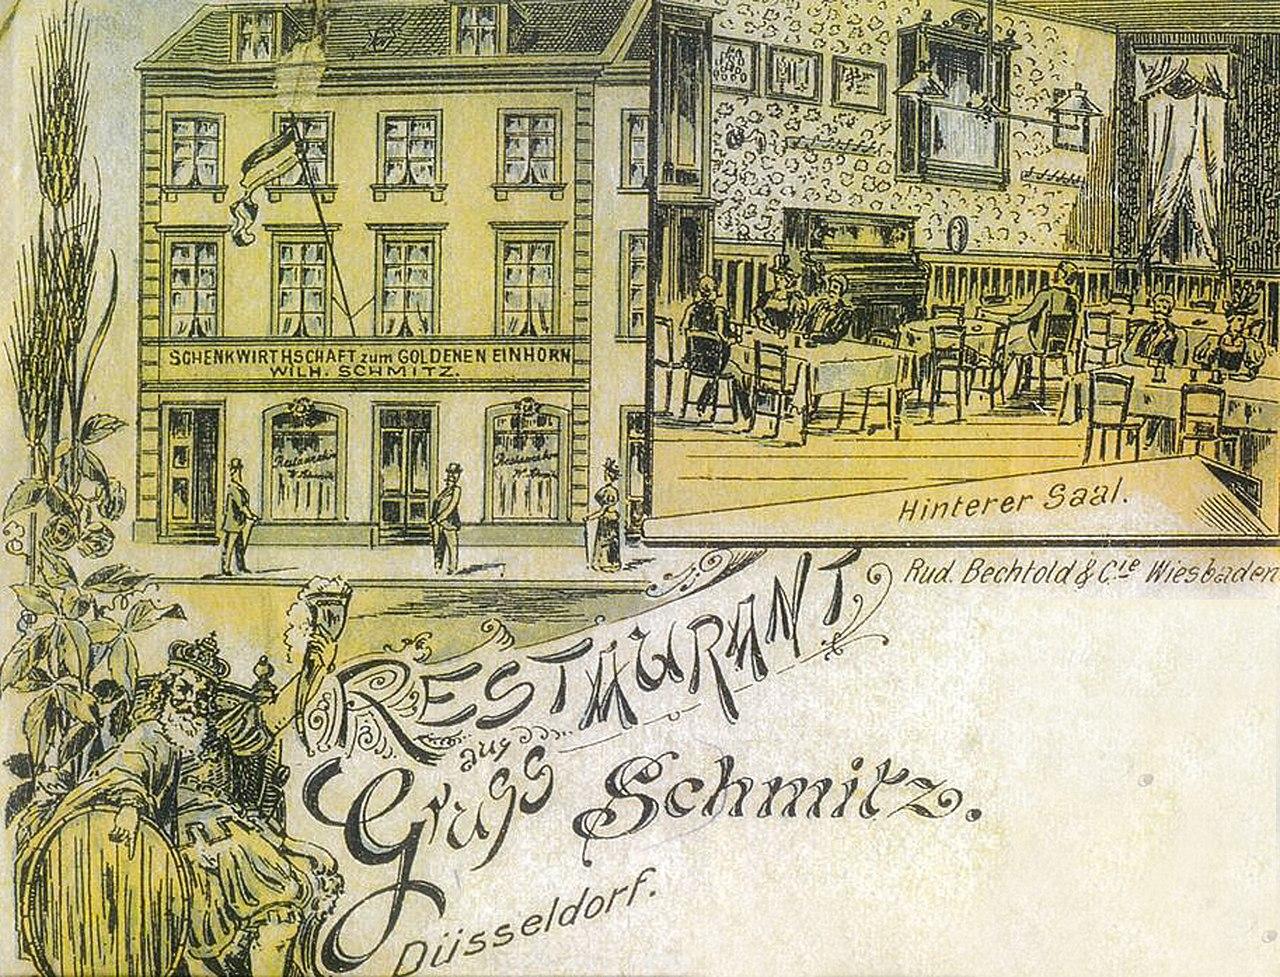 Einhorn Düsseldorf file zum goldenen einhorn 19 jh postkarte jpg wikimedia commons